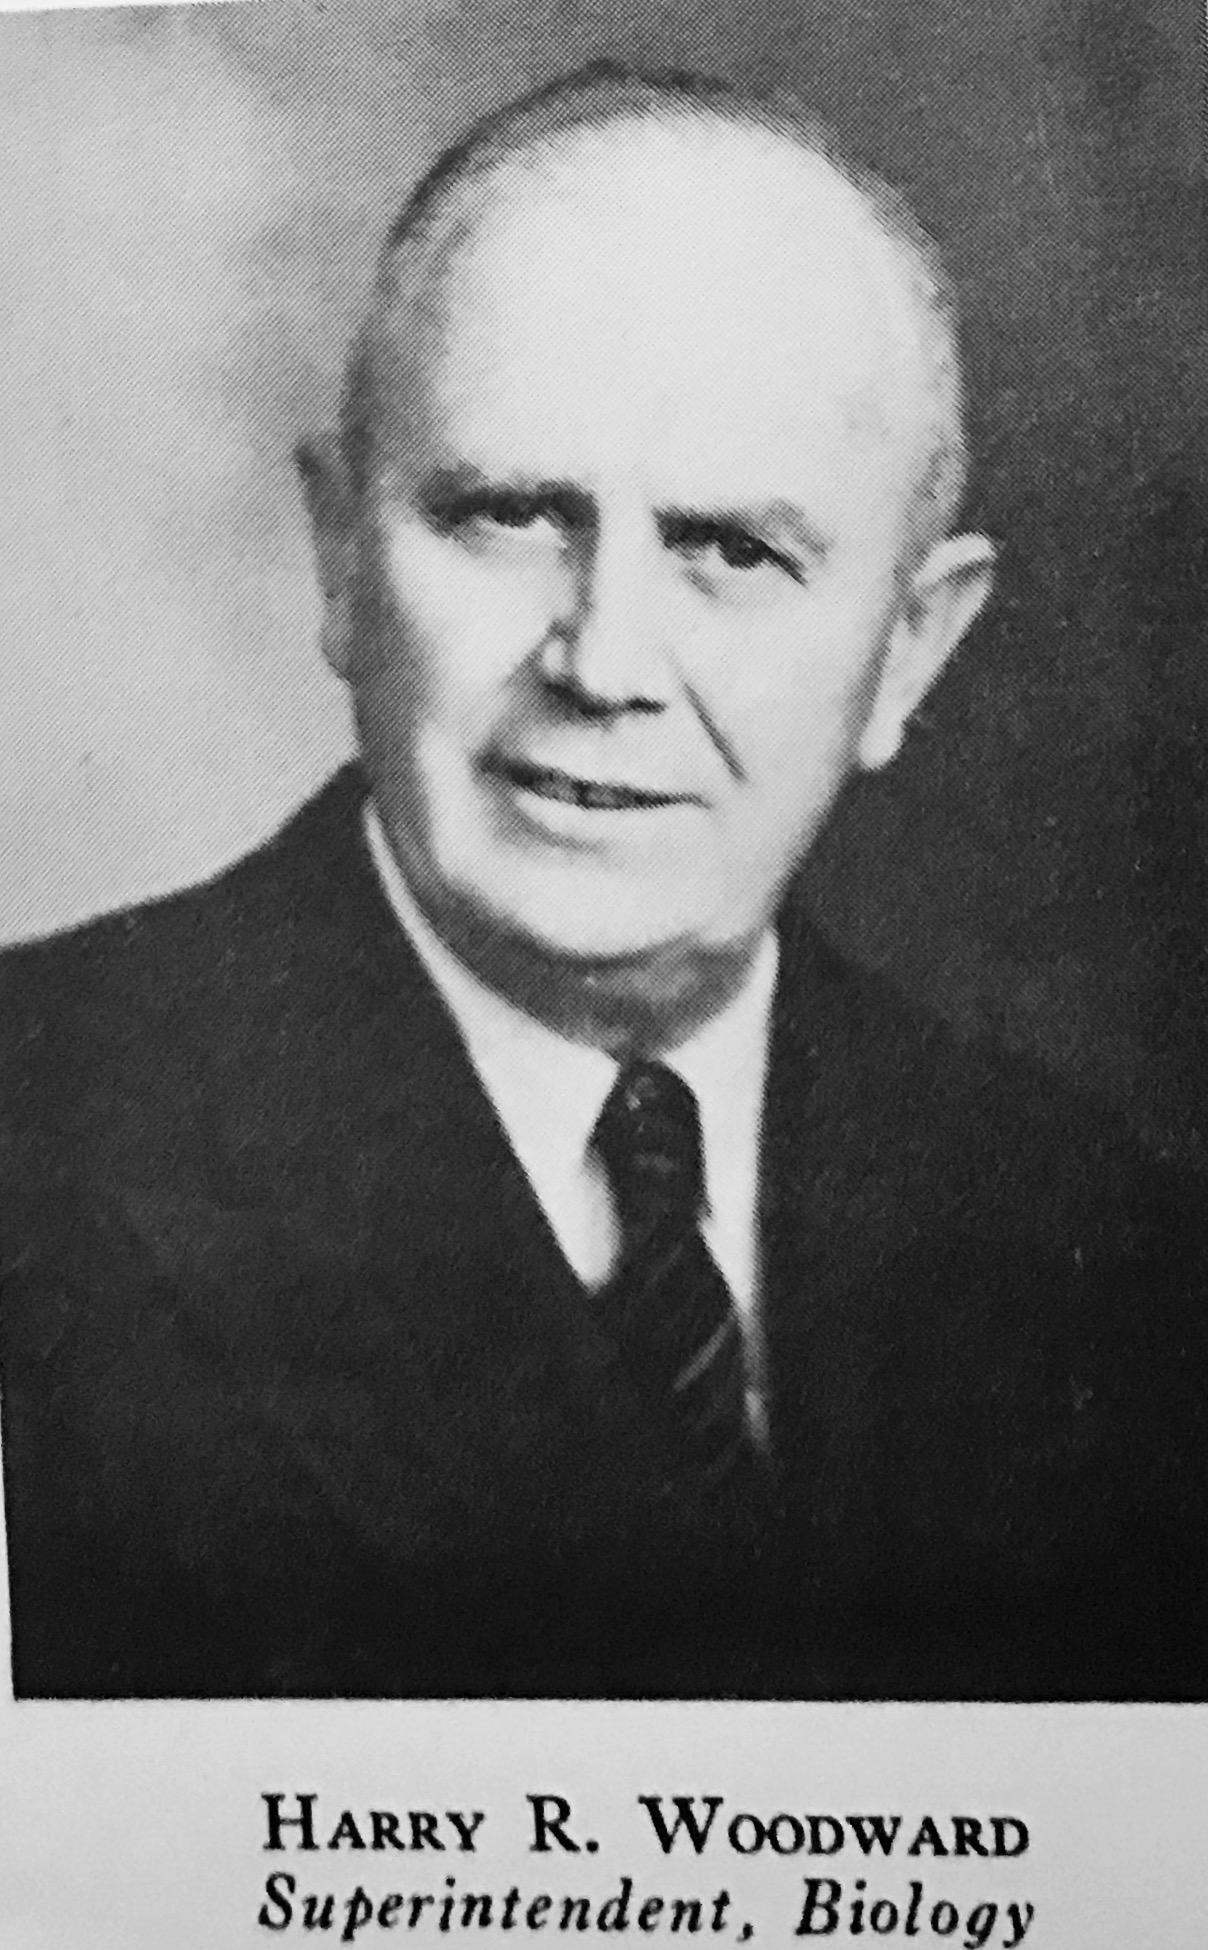 Harry R. Woodward